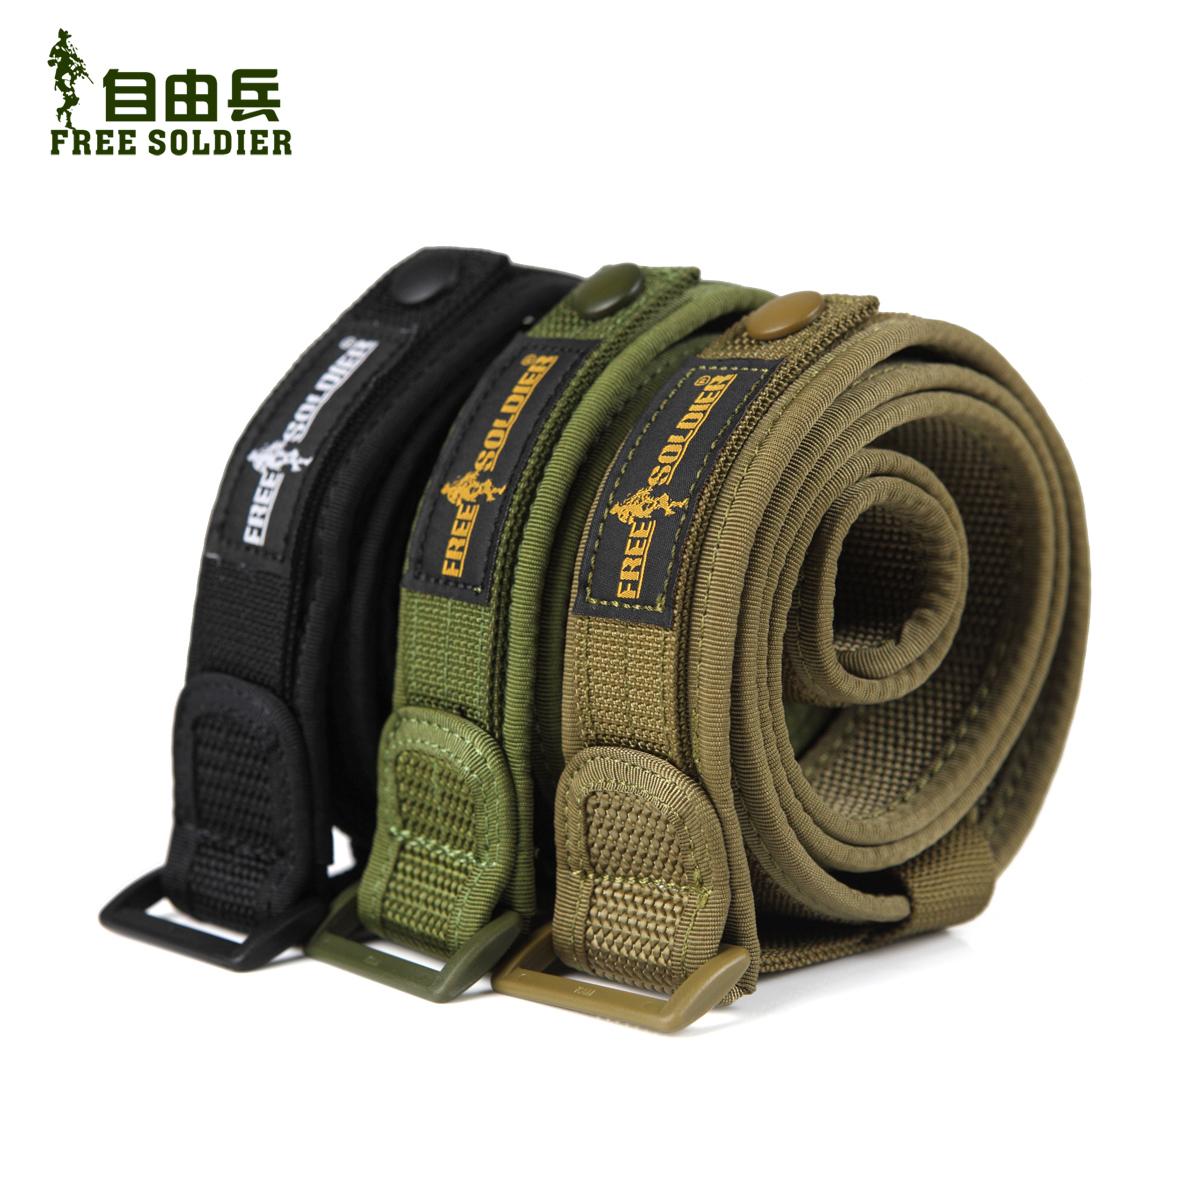 Пояса и ремни для туризма Free Soldier FS/yd03 1.5 Free Soldier / free soldiers